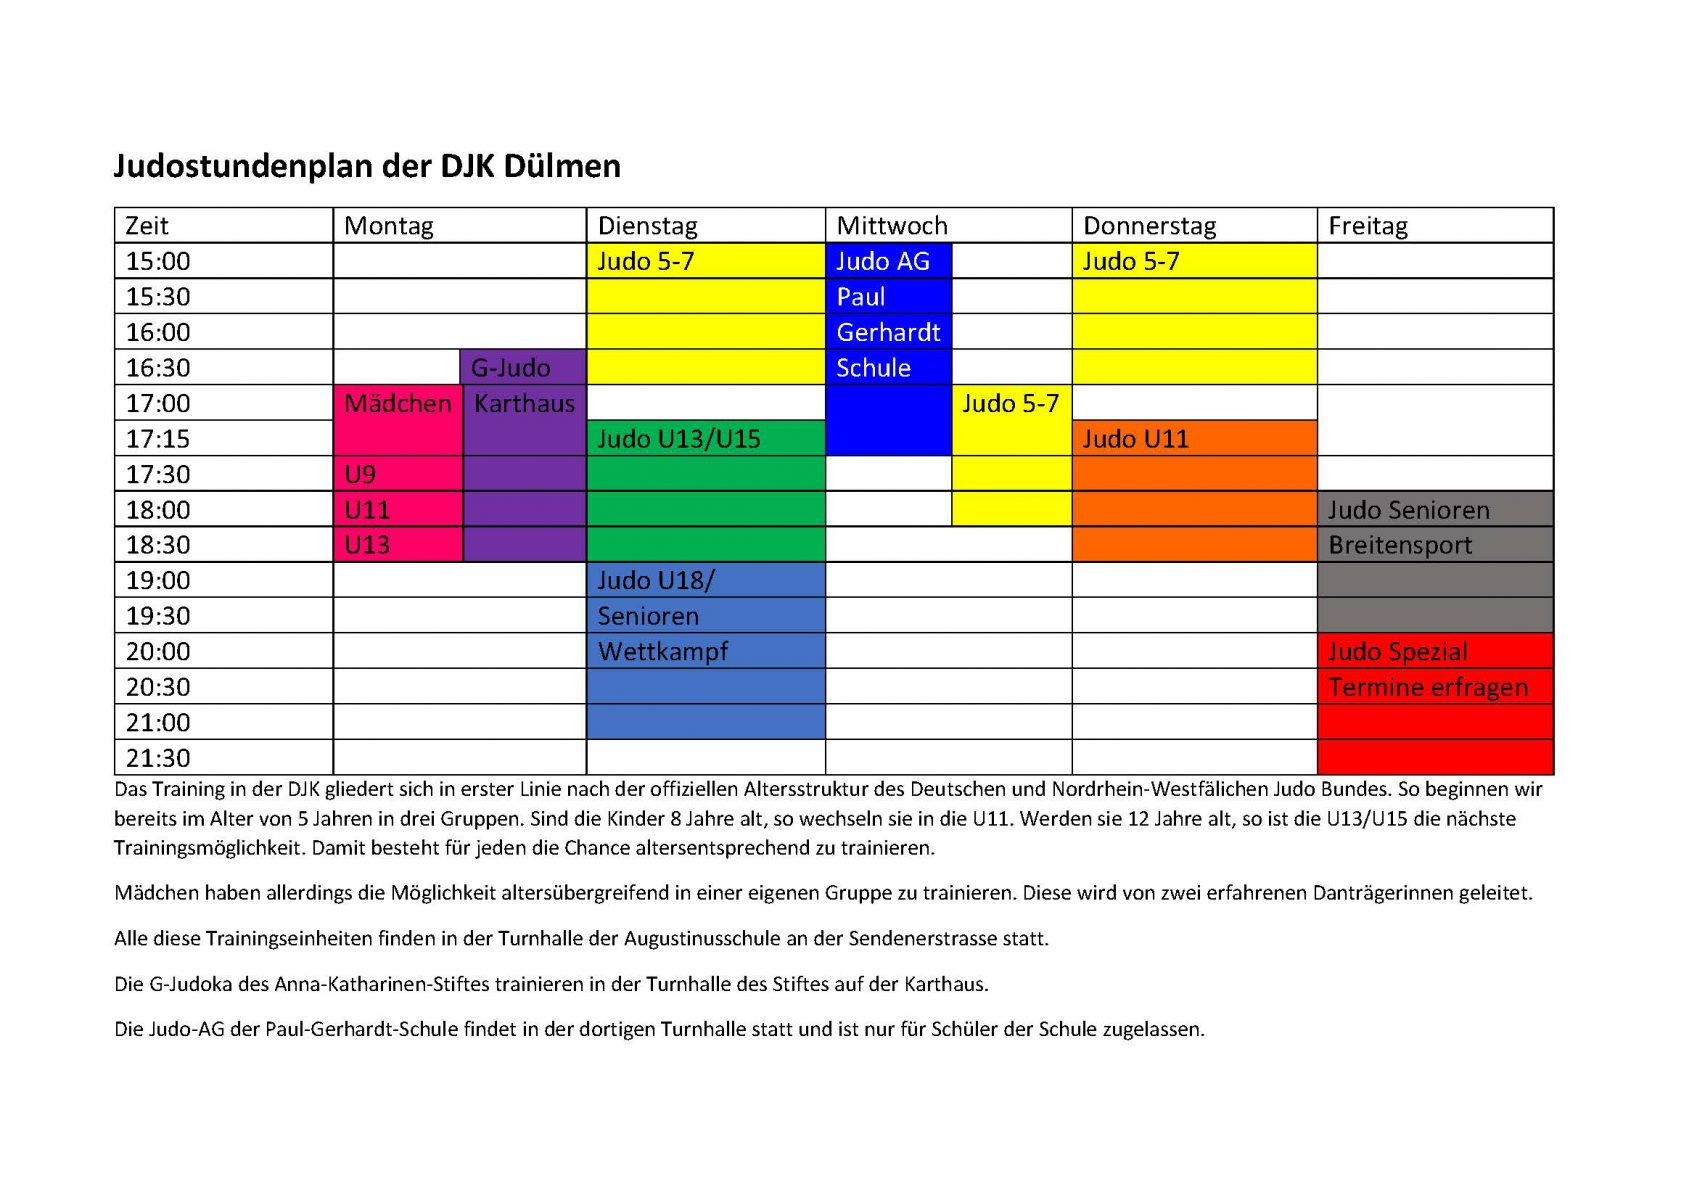 Judostundenplan der DJK Dülmen